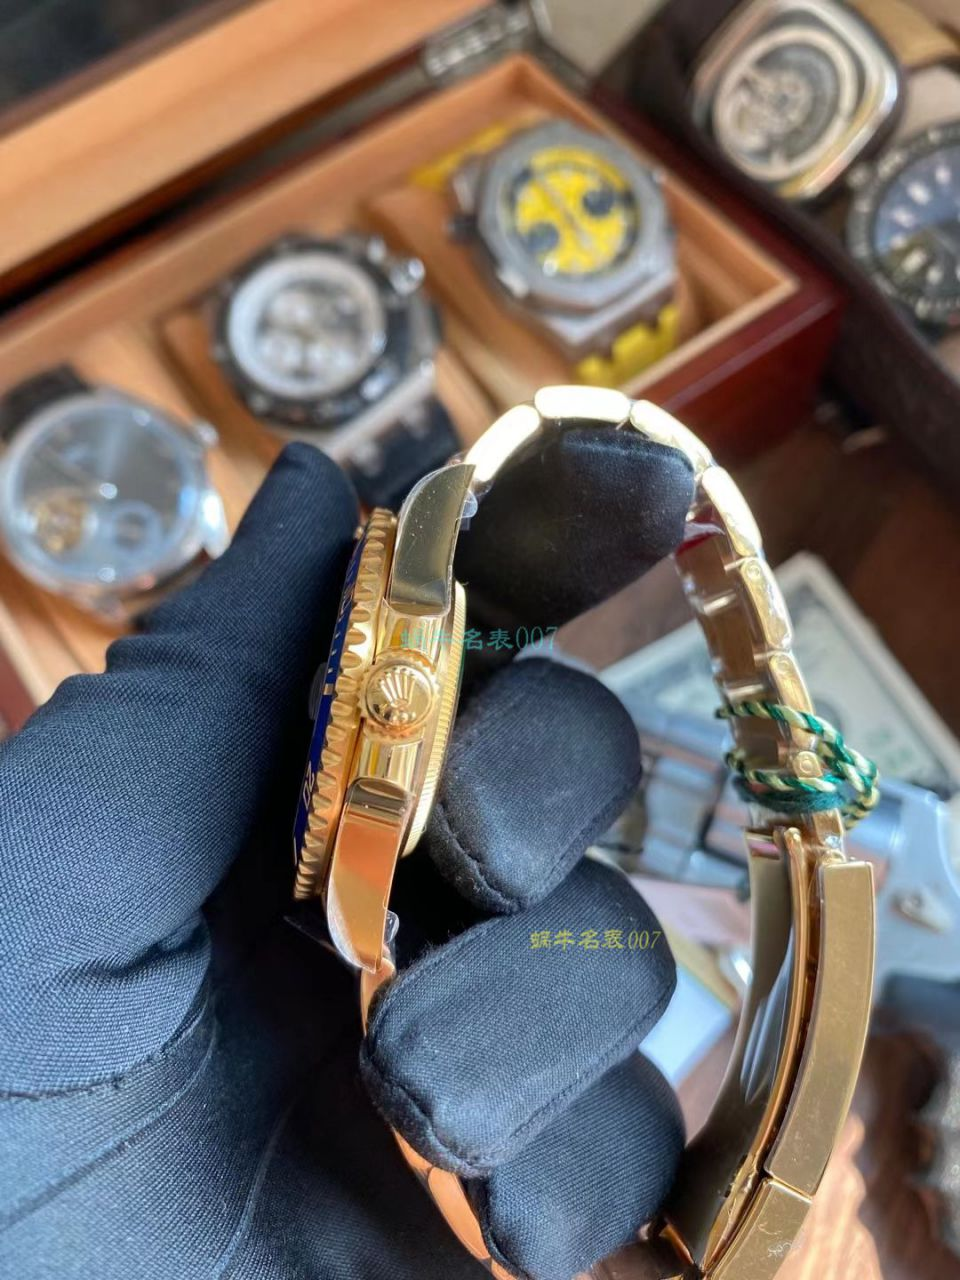 VS厂劳力士潜航者全金黑水鬼超A高仿手表116618LN-97208手表 / R738